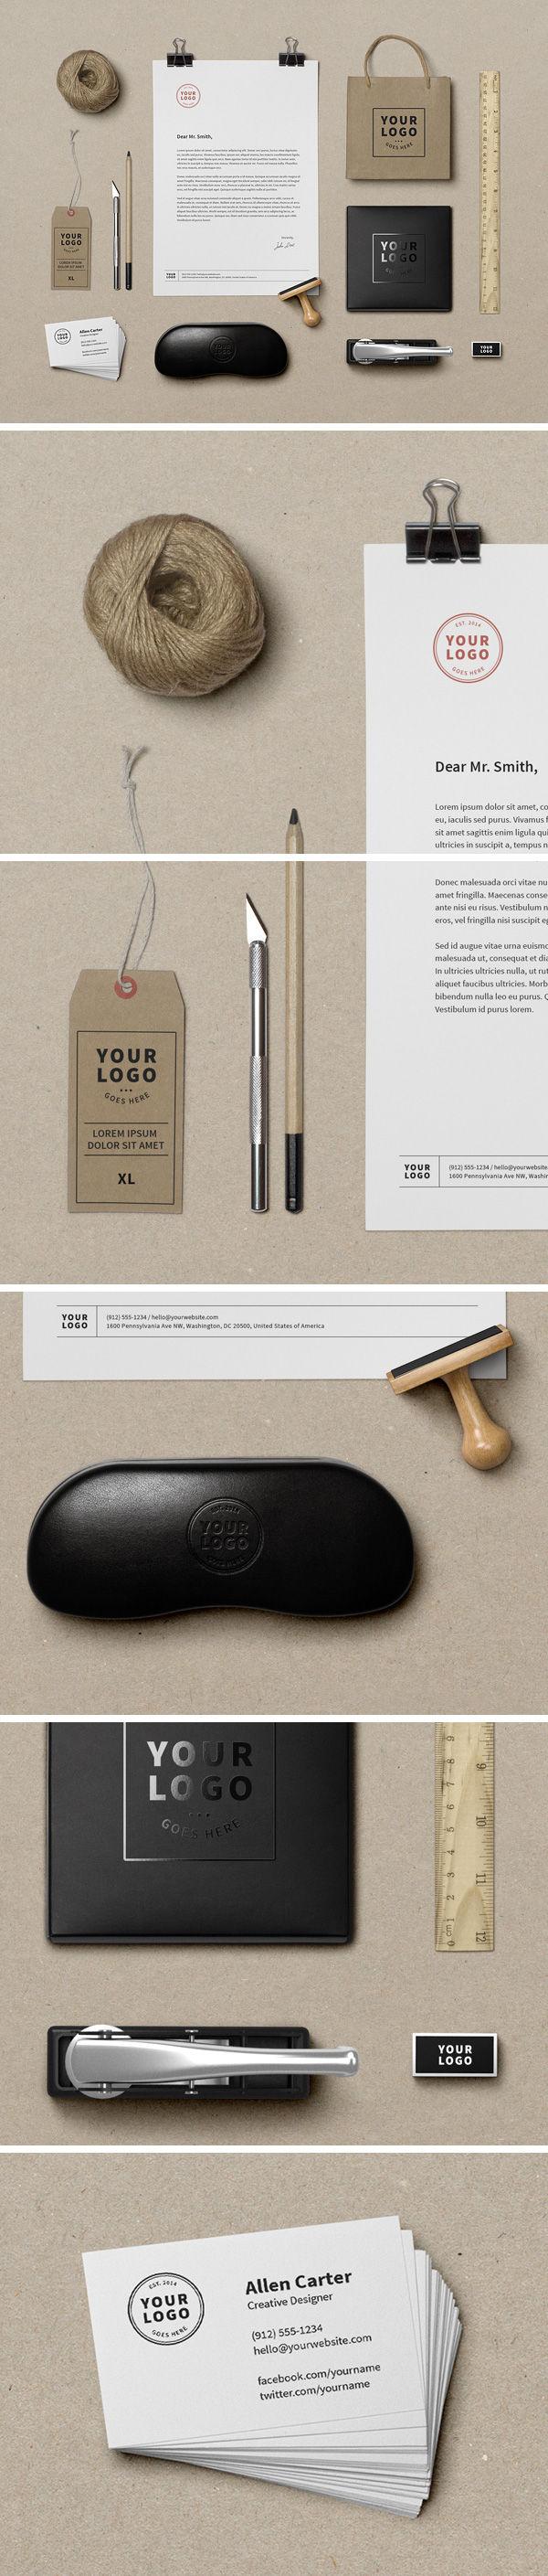 Branding-Identity-MockUp-Vol9-600